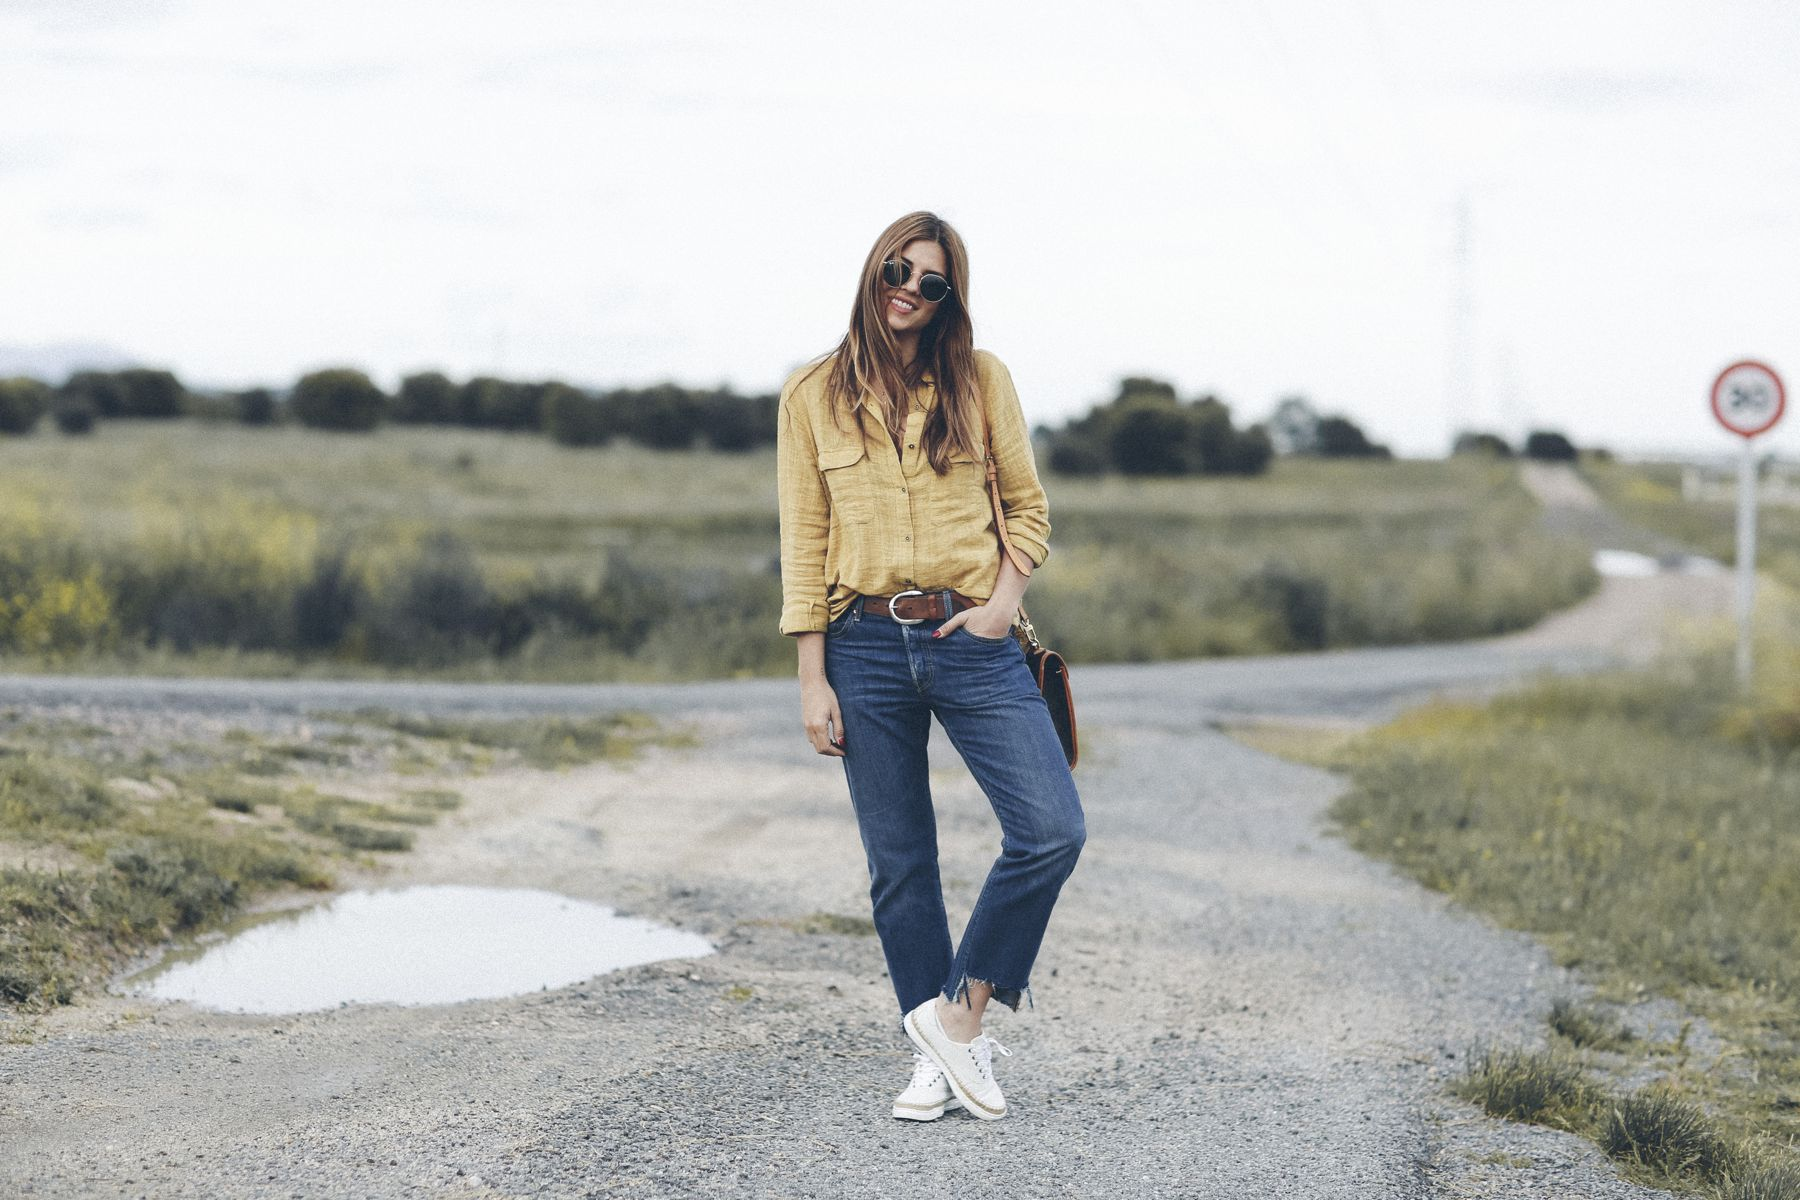 zapatillas sneakers ugg australia outfit look primavera spring camisa mango vaqueros jeans boyfriend oversize levis Rayban gafas de sol sunglasses street style trendy taste bolso bag louis vuitton _2